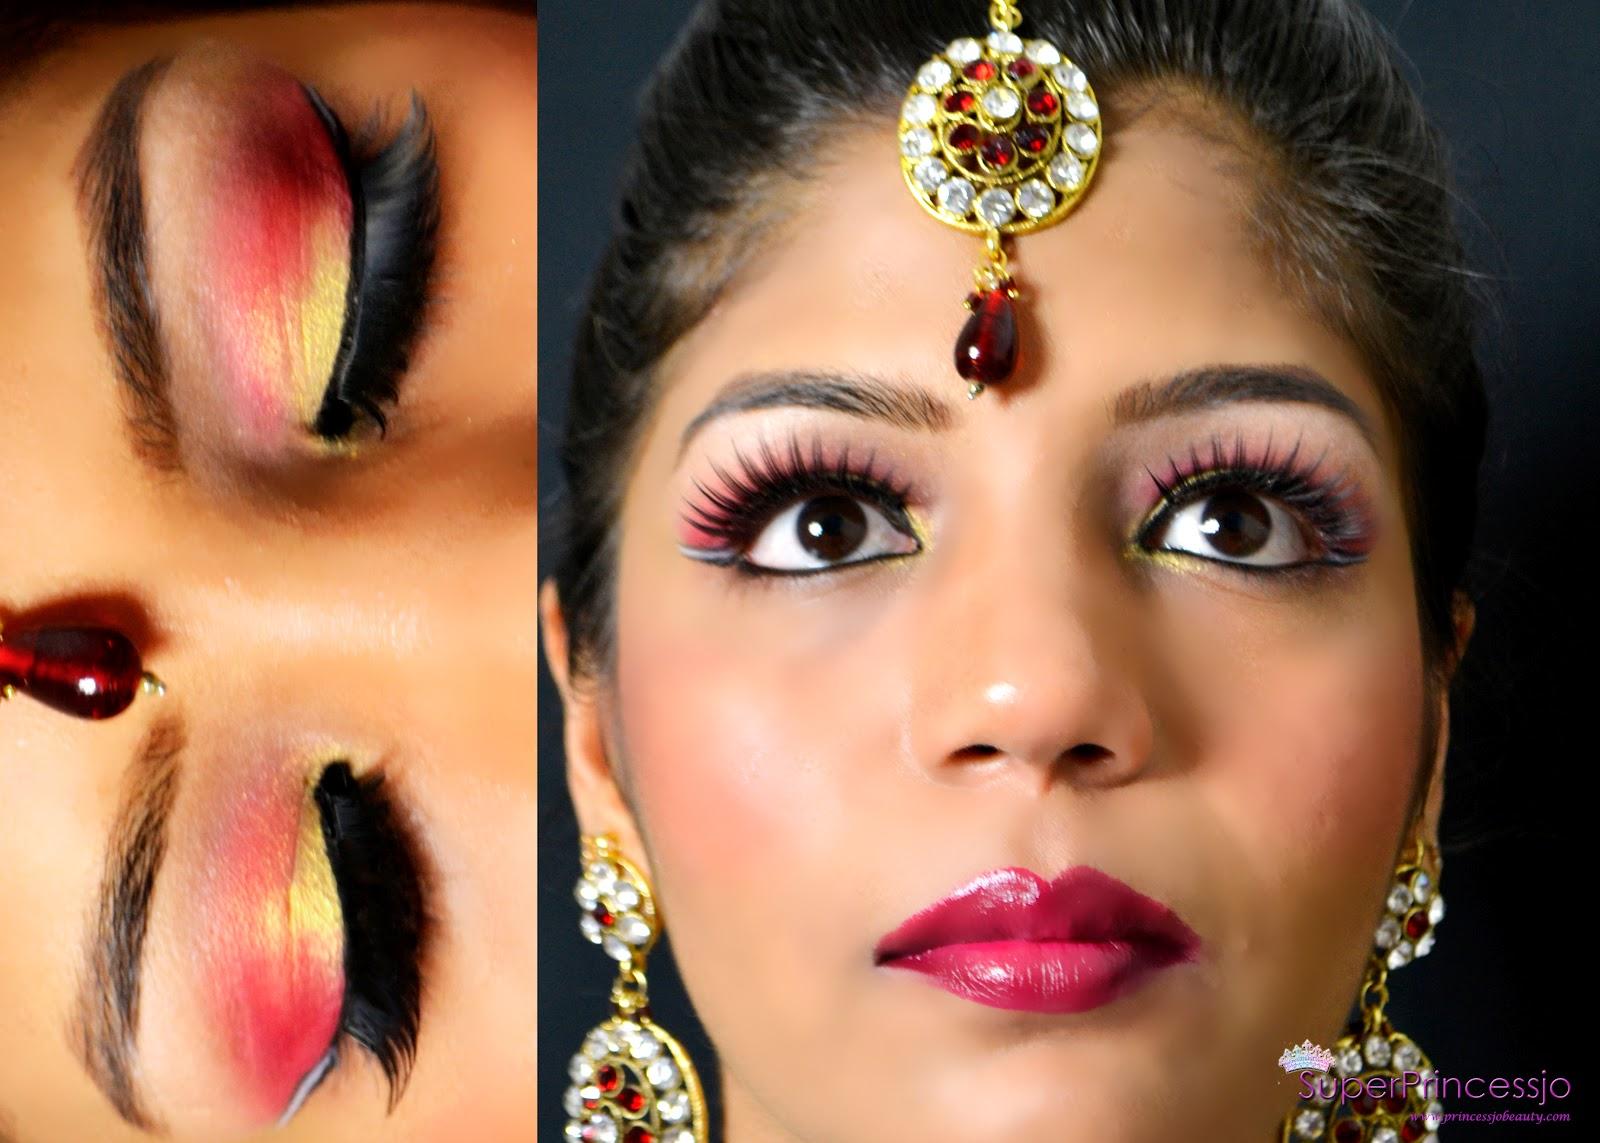 superprincessjo : indian bridal wedding makeup -red gold eye makeup